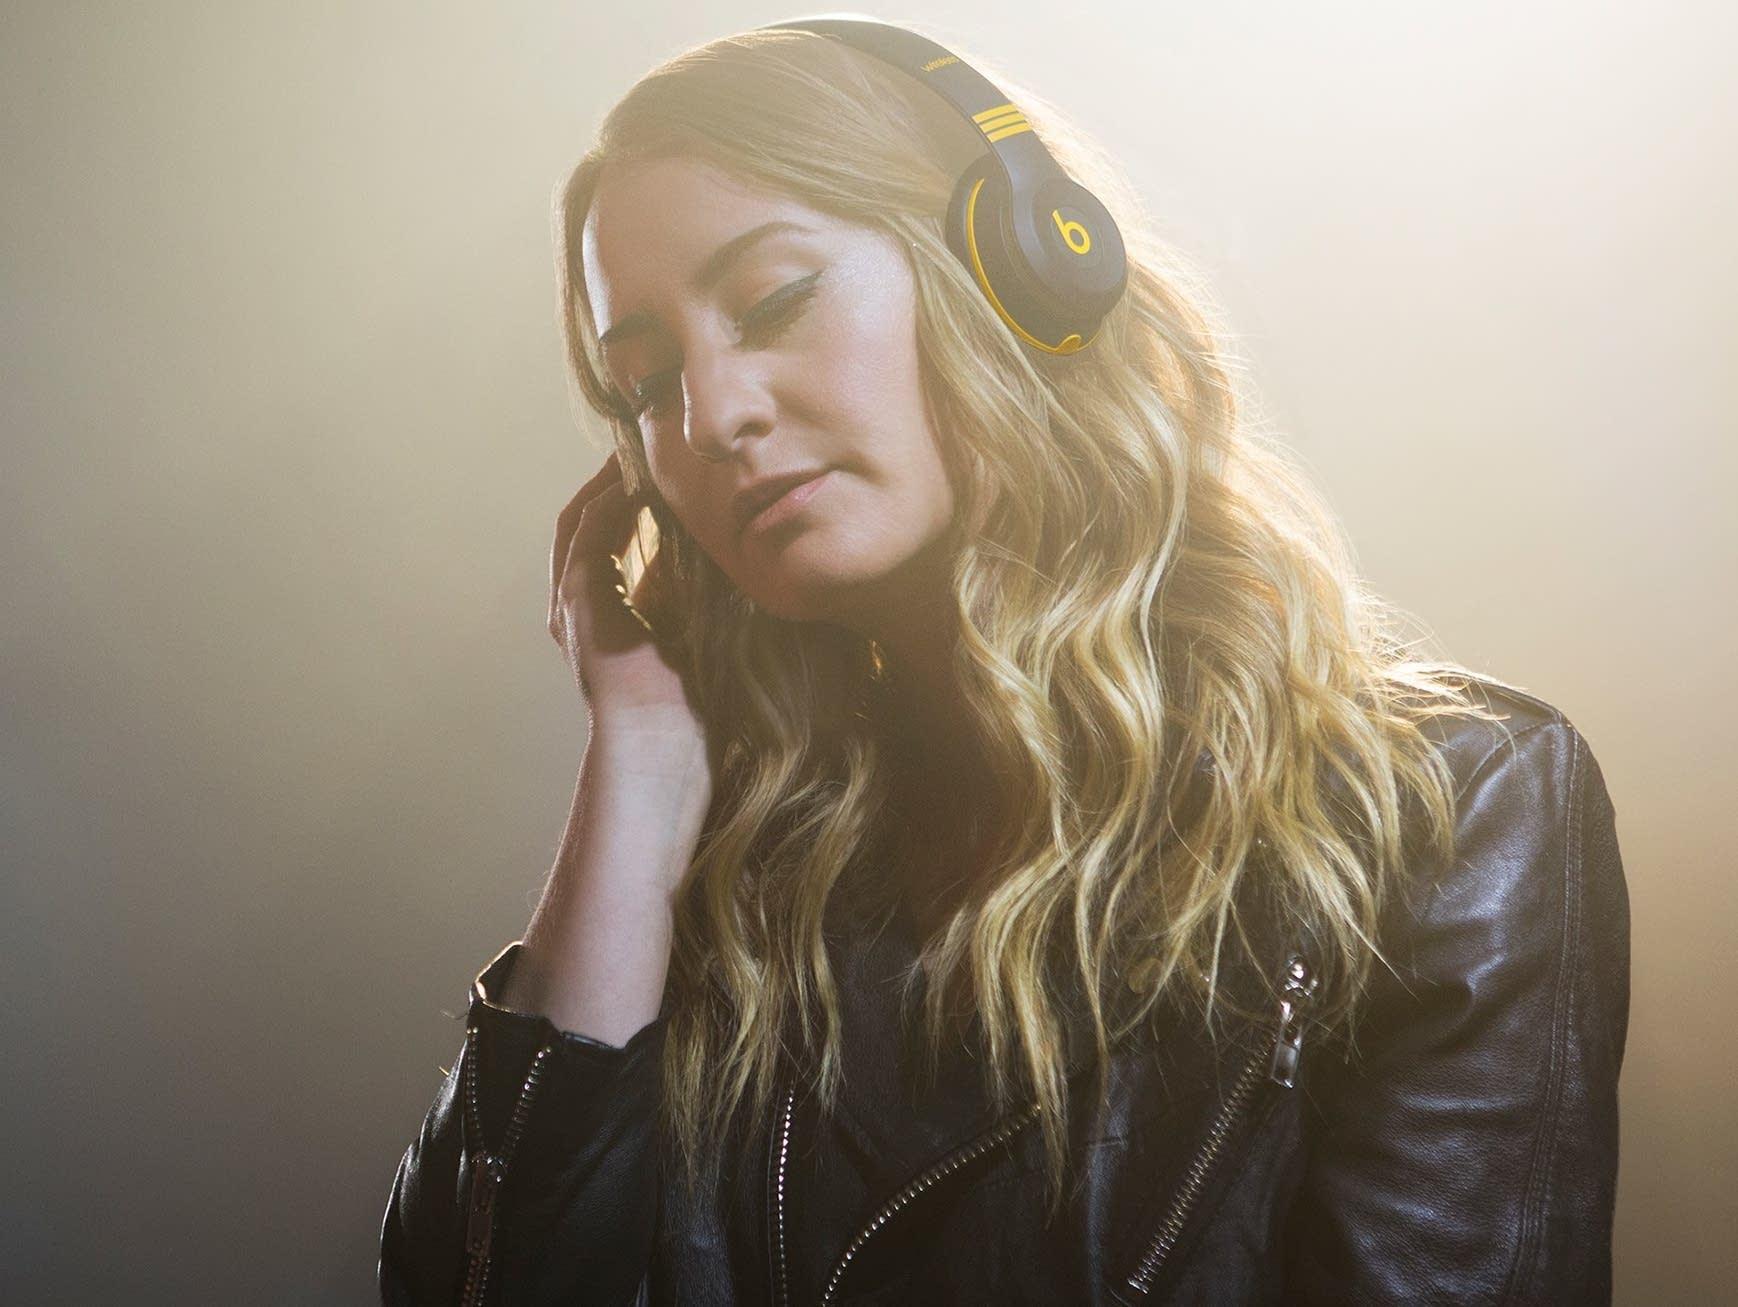 Margo Price models Beats by Dre Third Man Records headphones.